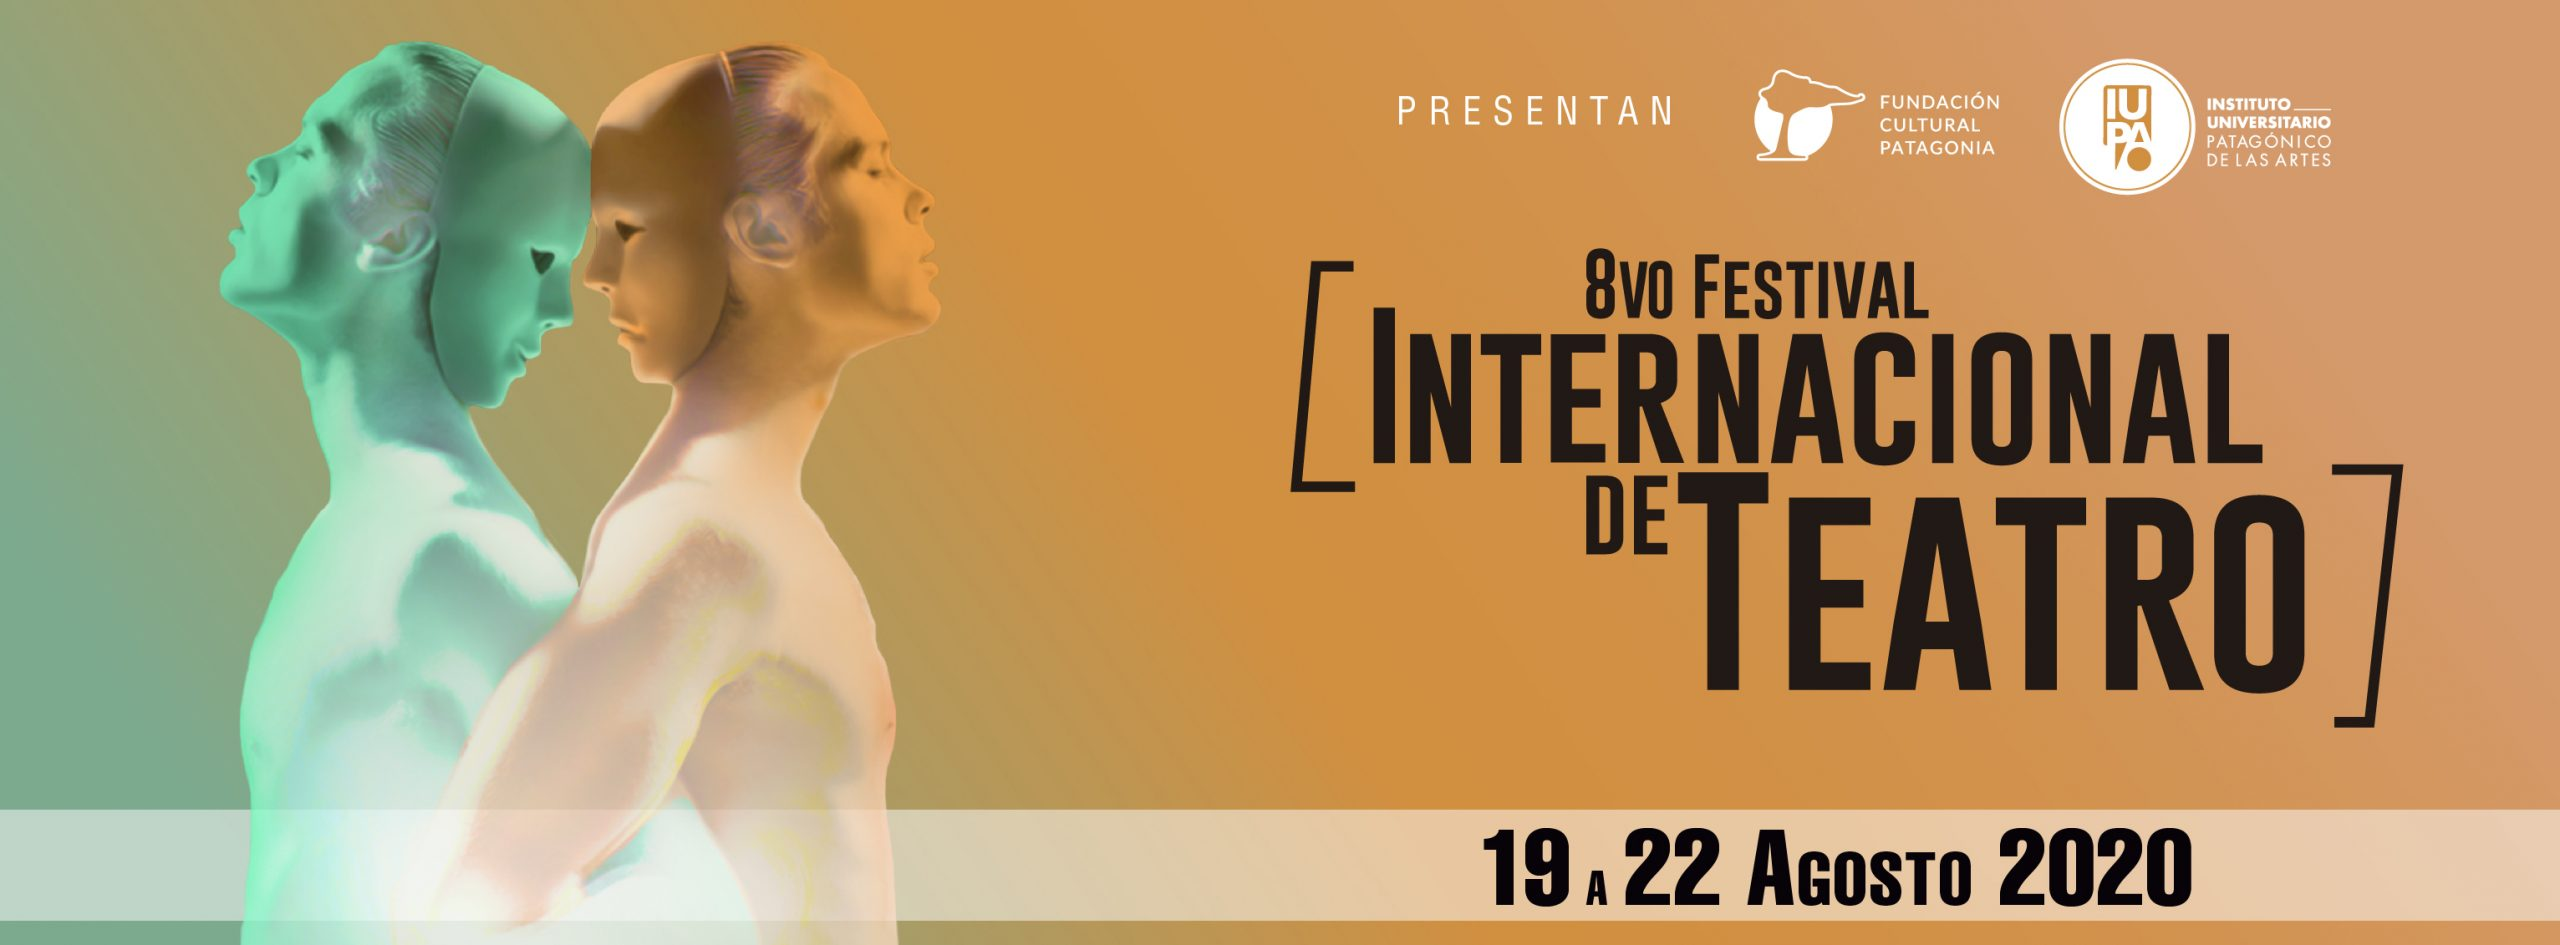 flyer festi teatro 2020